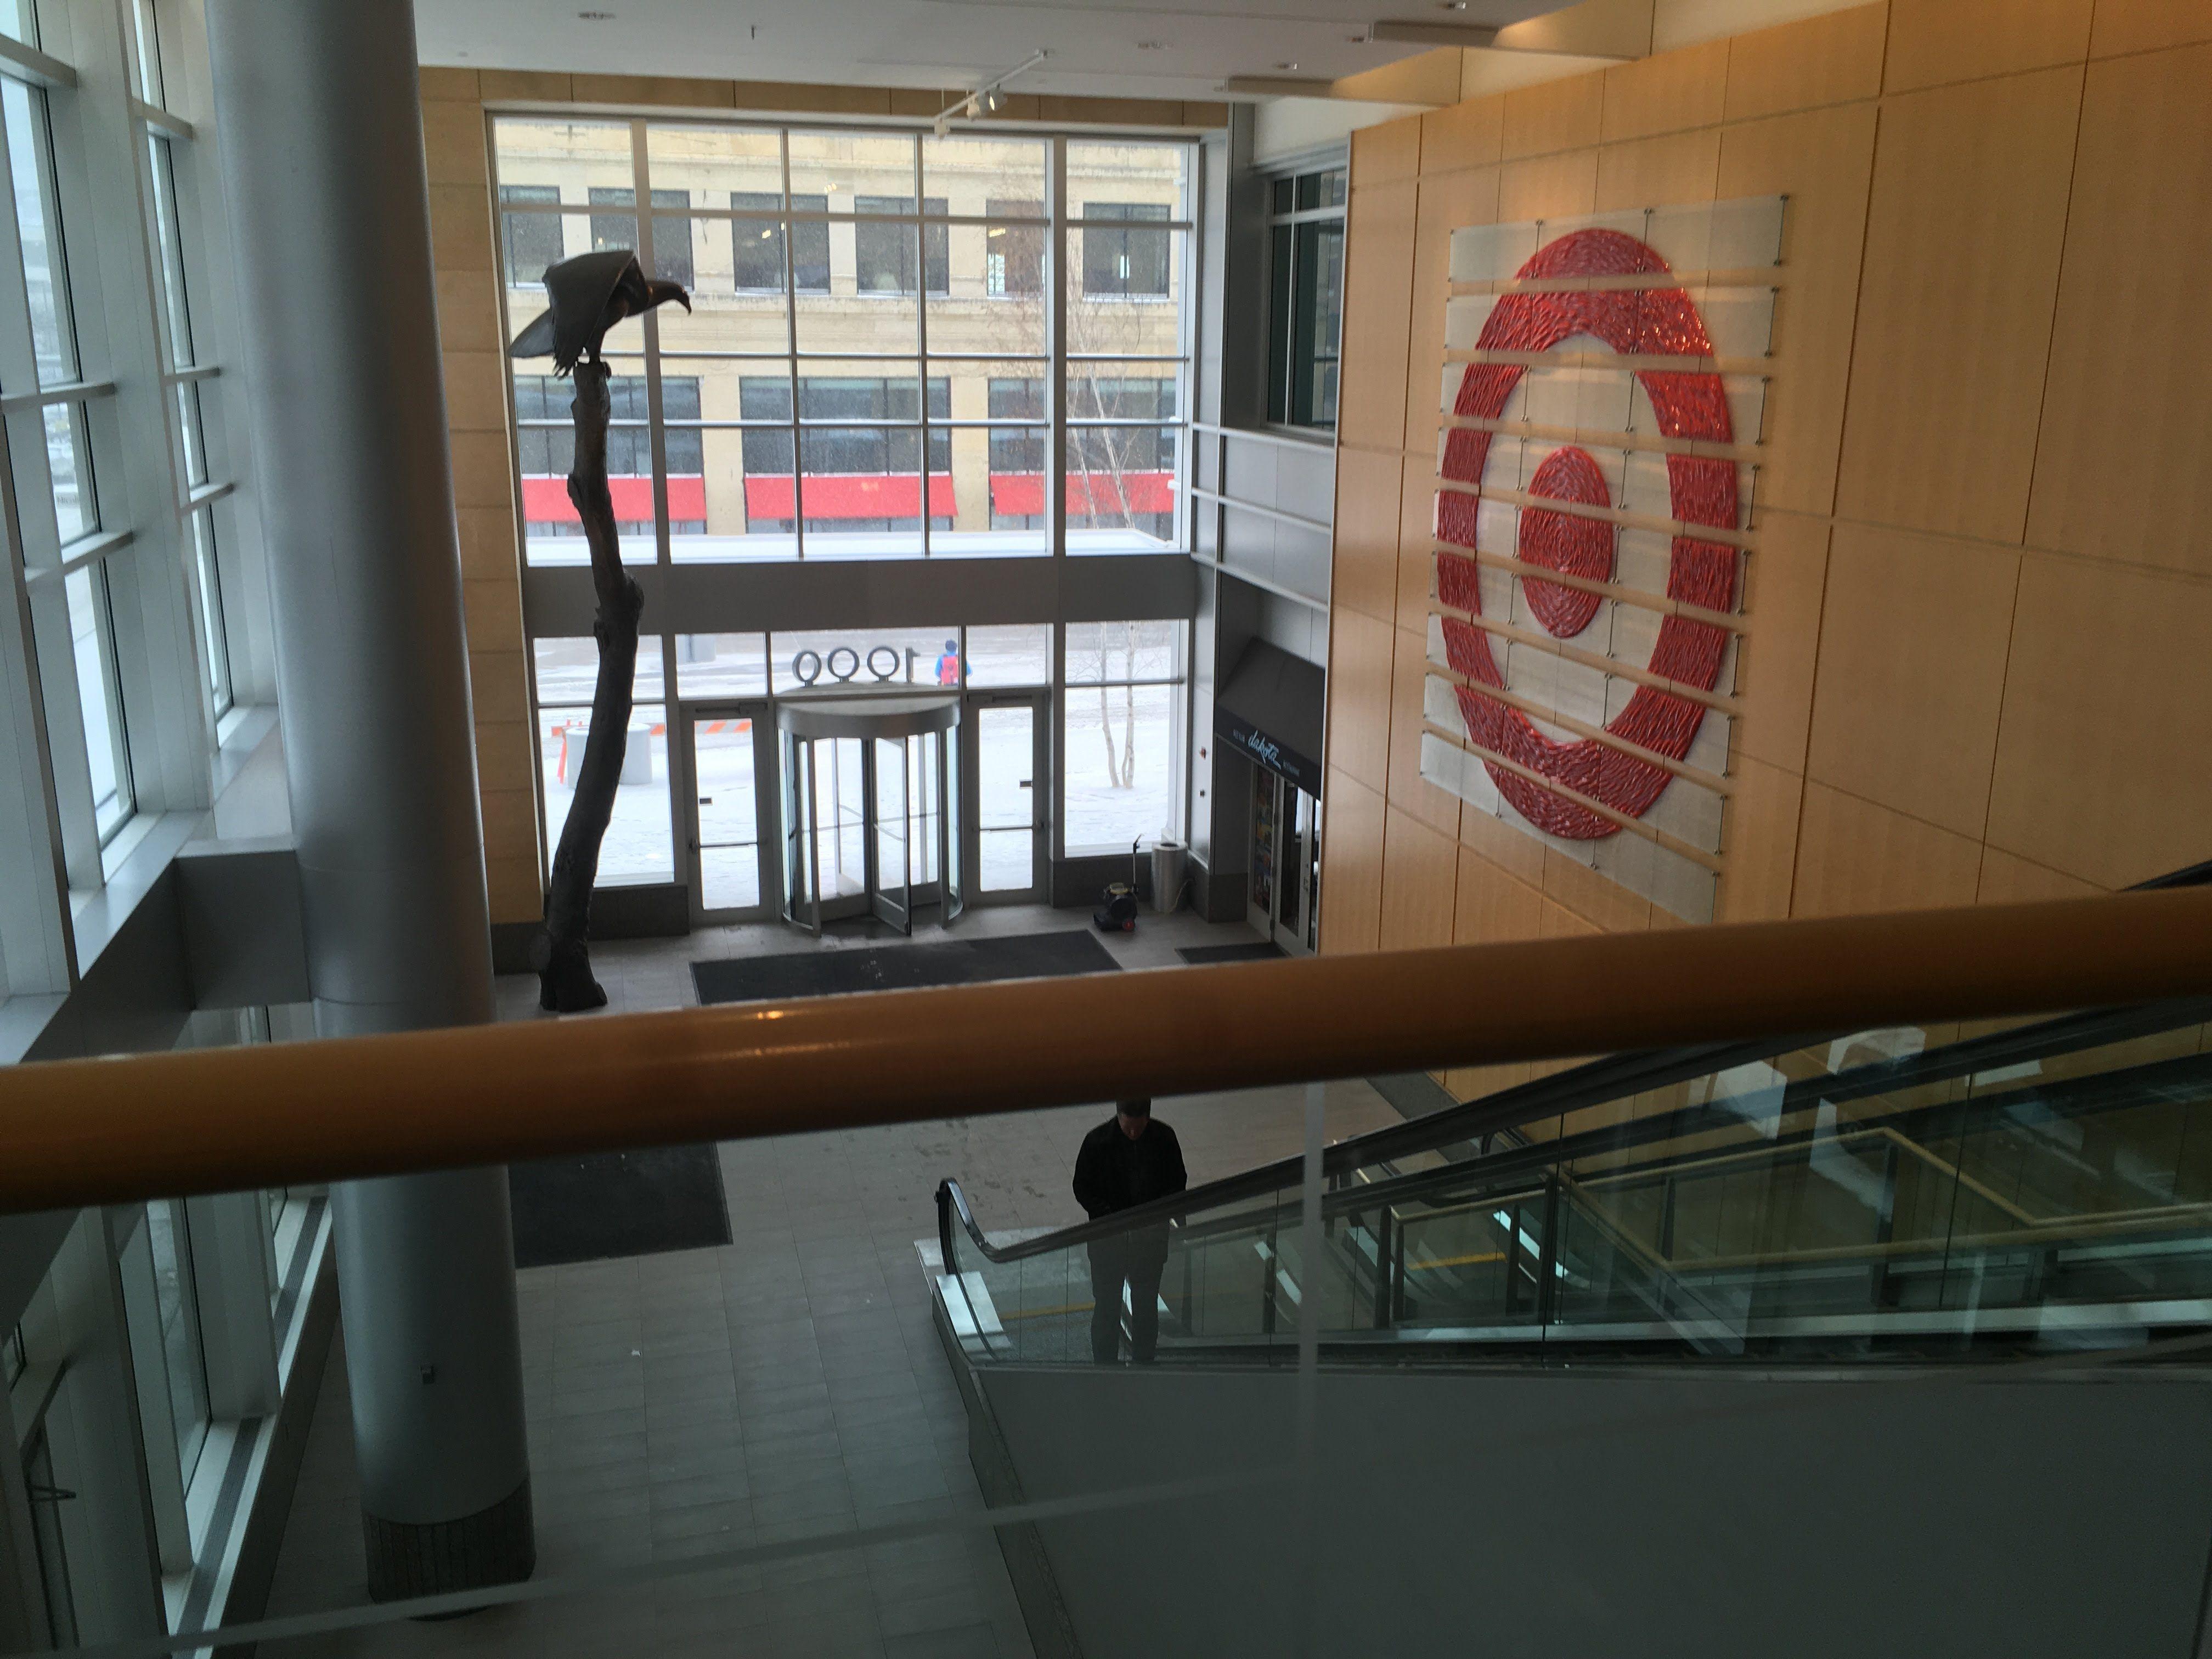 Escalator Going Down To Target Hq And The Dakota Thedakota